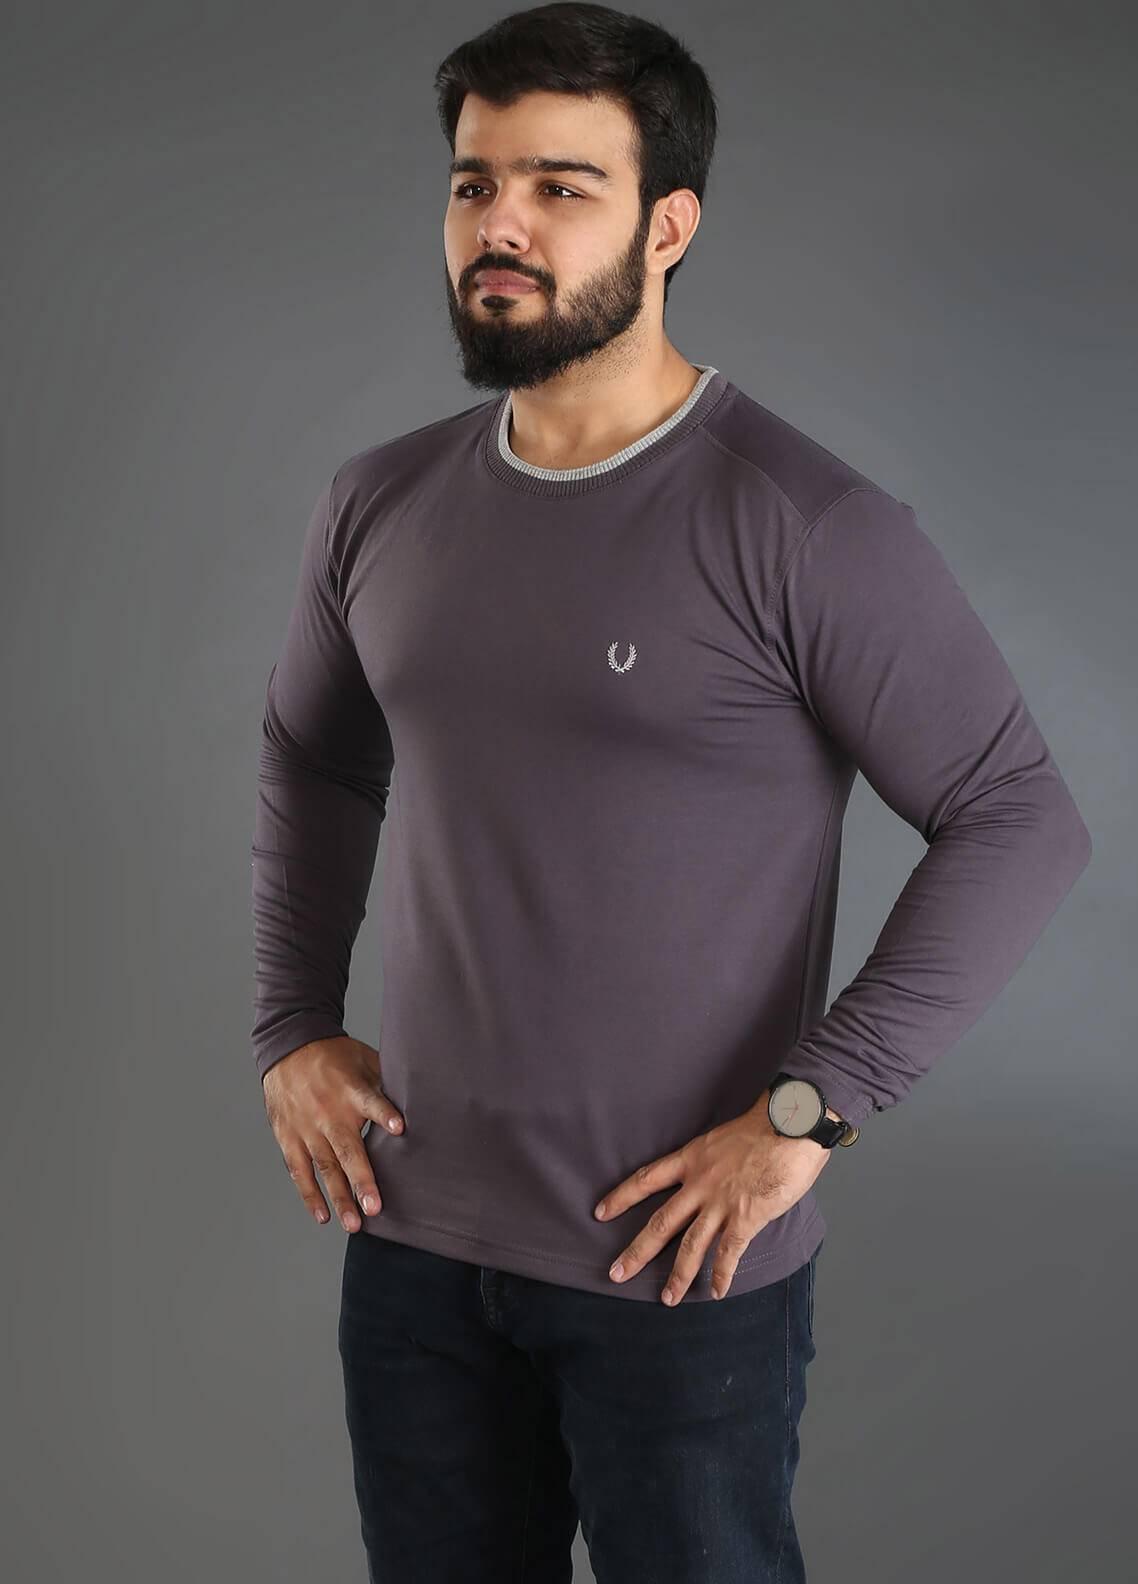 UC Clothing Jersey Plain Texture Men T-Shirts - Ash Grey UC18TS 04